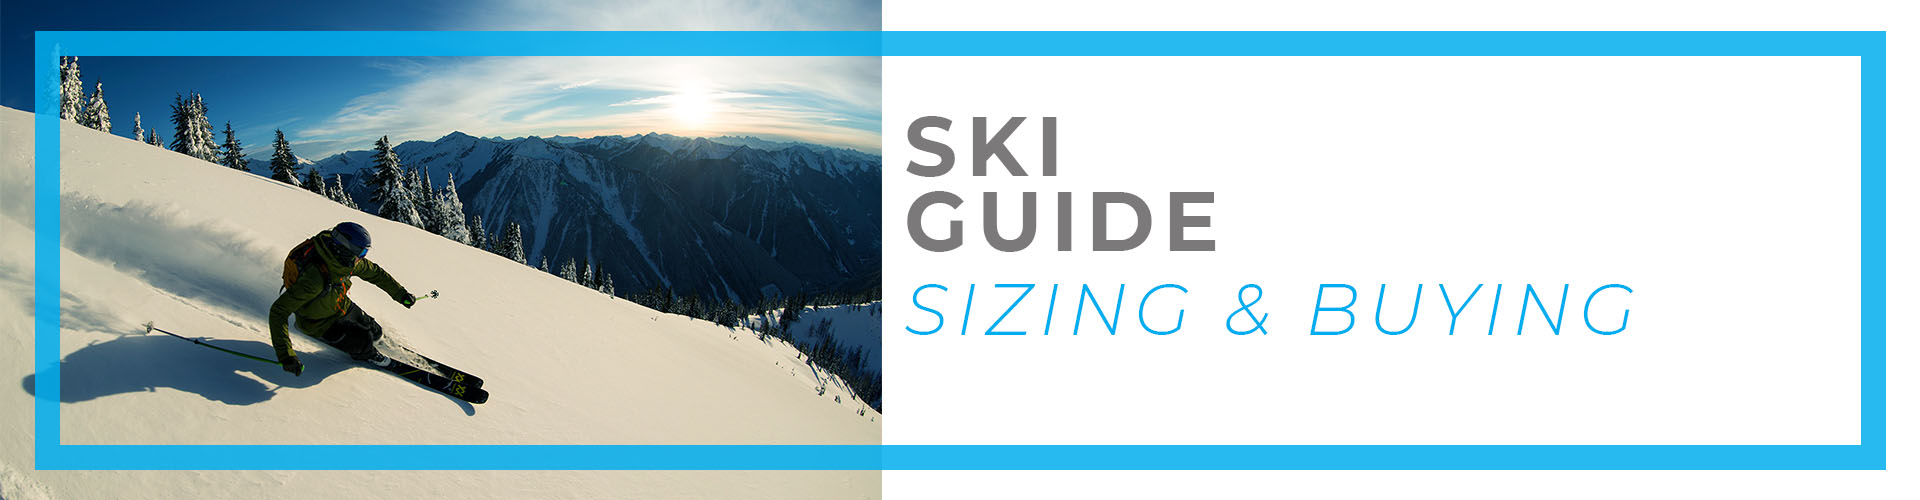 skibuyingguide-banner-1920x500.jpg